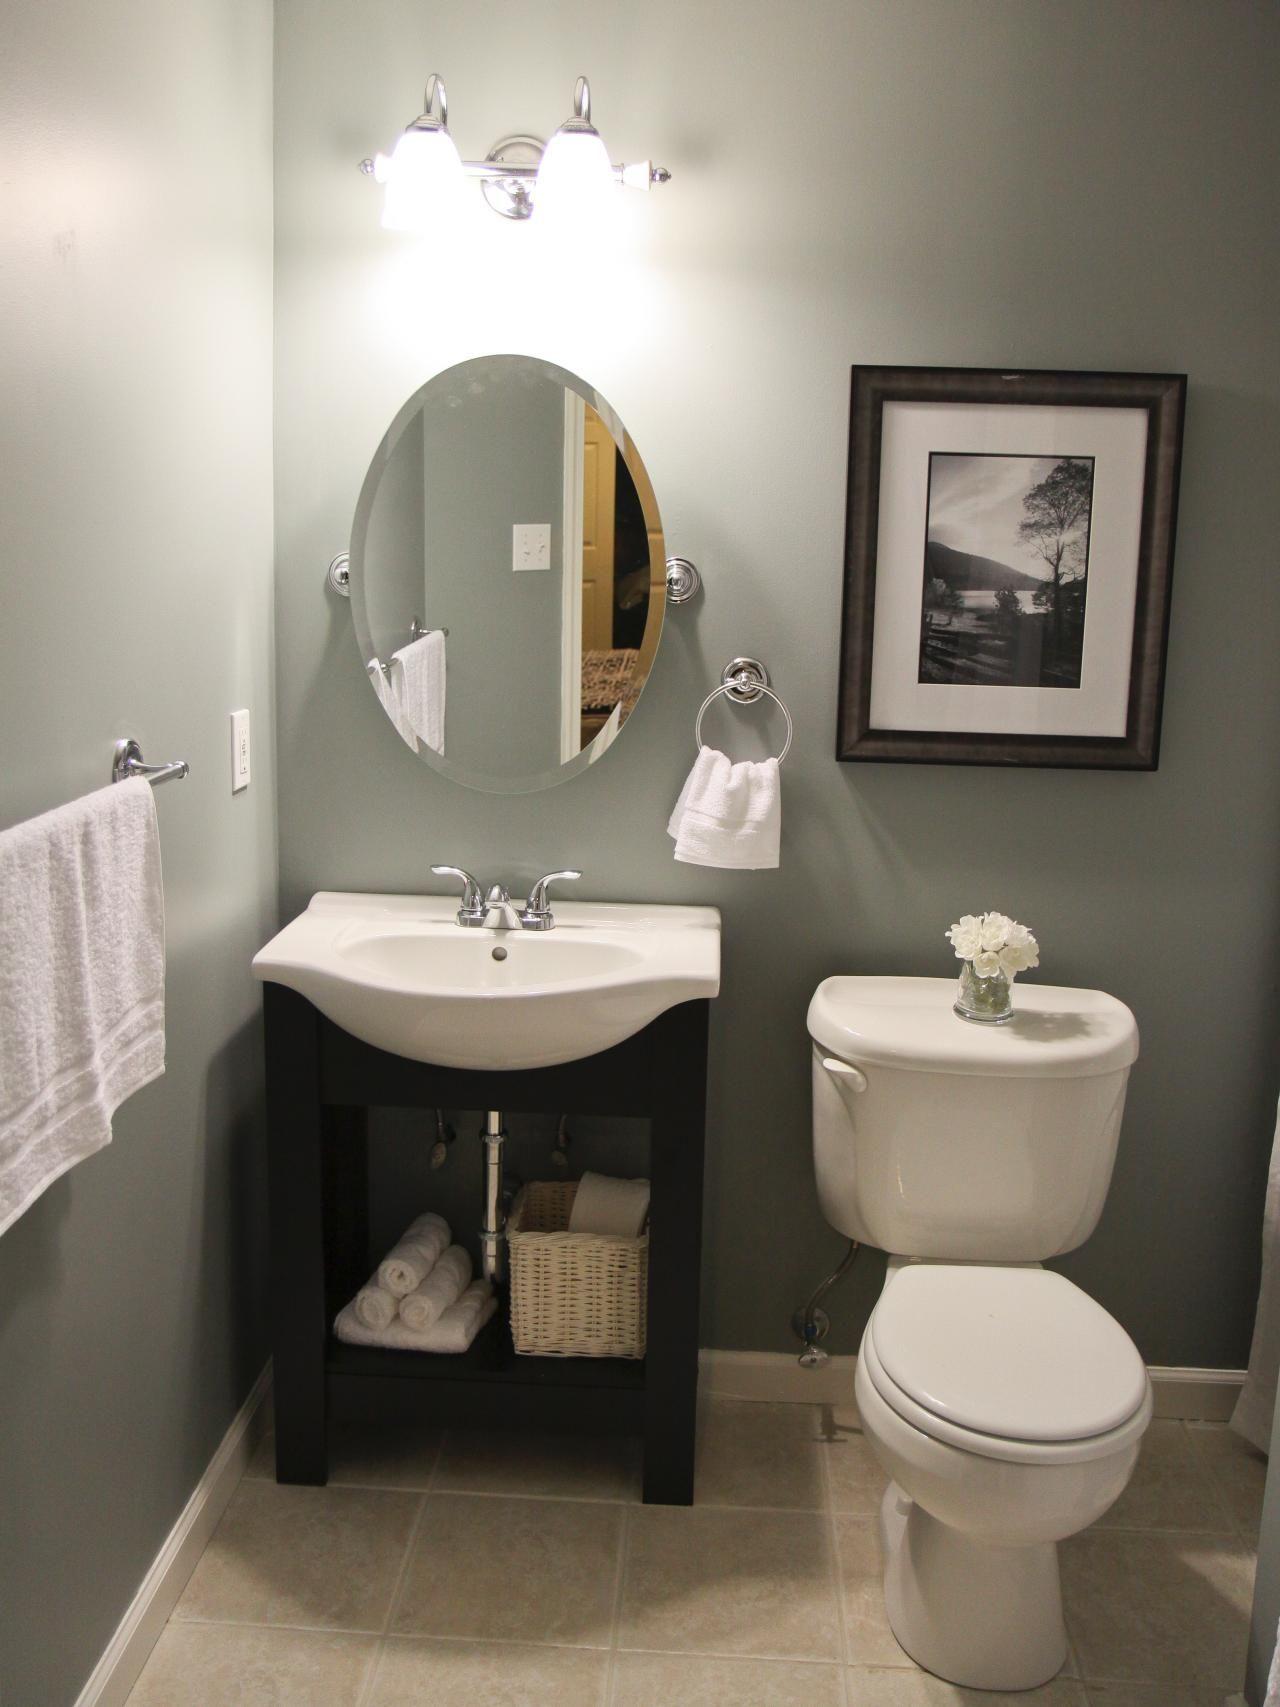 Budget Bathroom Remodels Budget bathroom remodel Budget bathroom